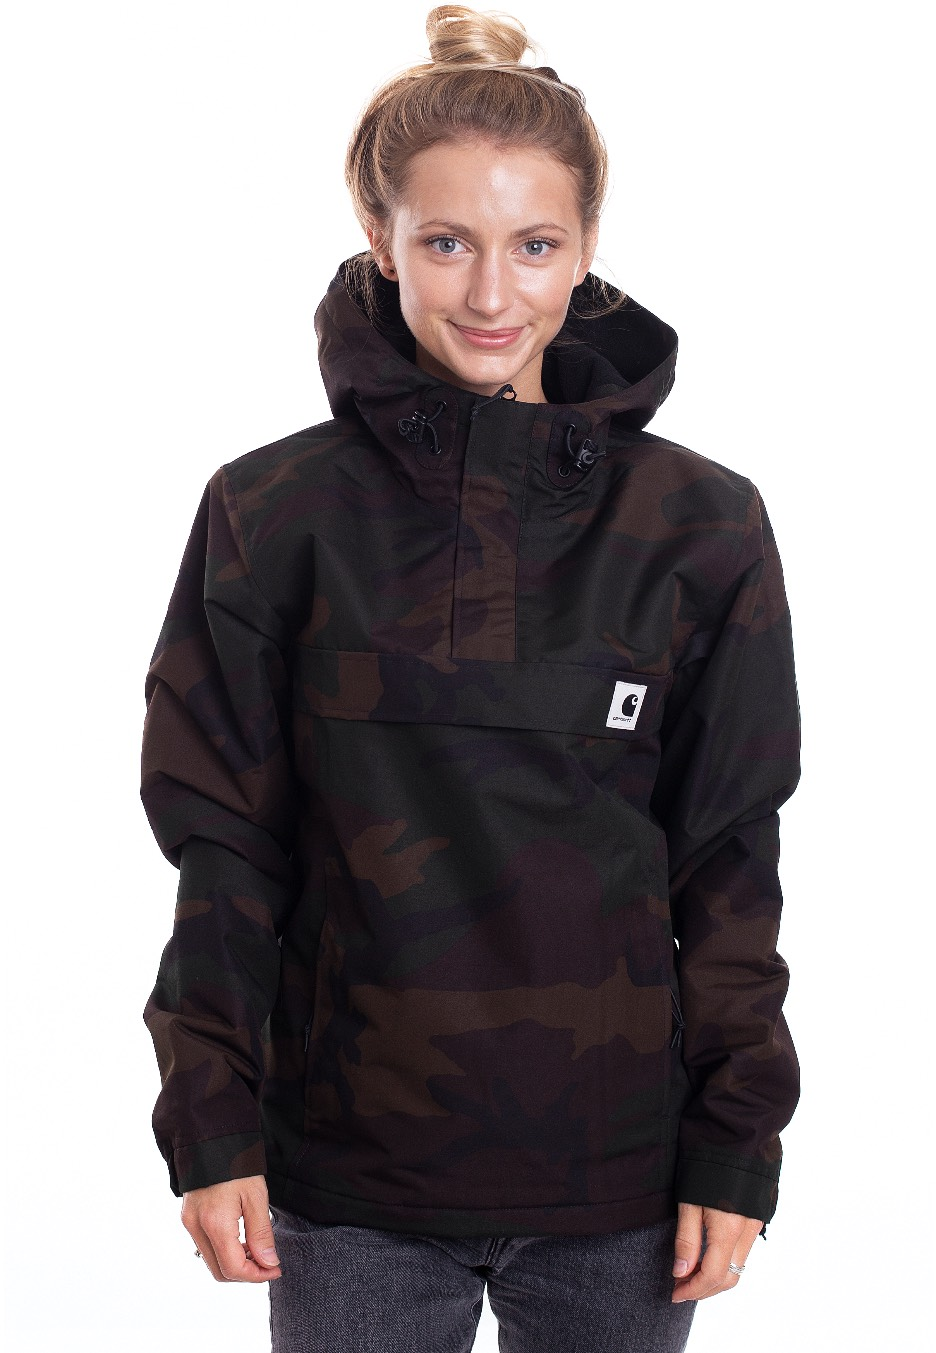 Jacken - Carhartt WIP W' Nimbus Camo Evergreen Winter Jacken  - Onlineshop IMPERICON